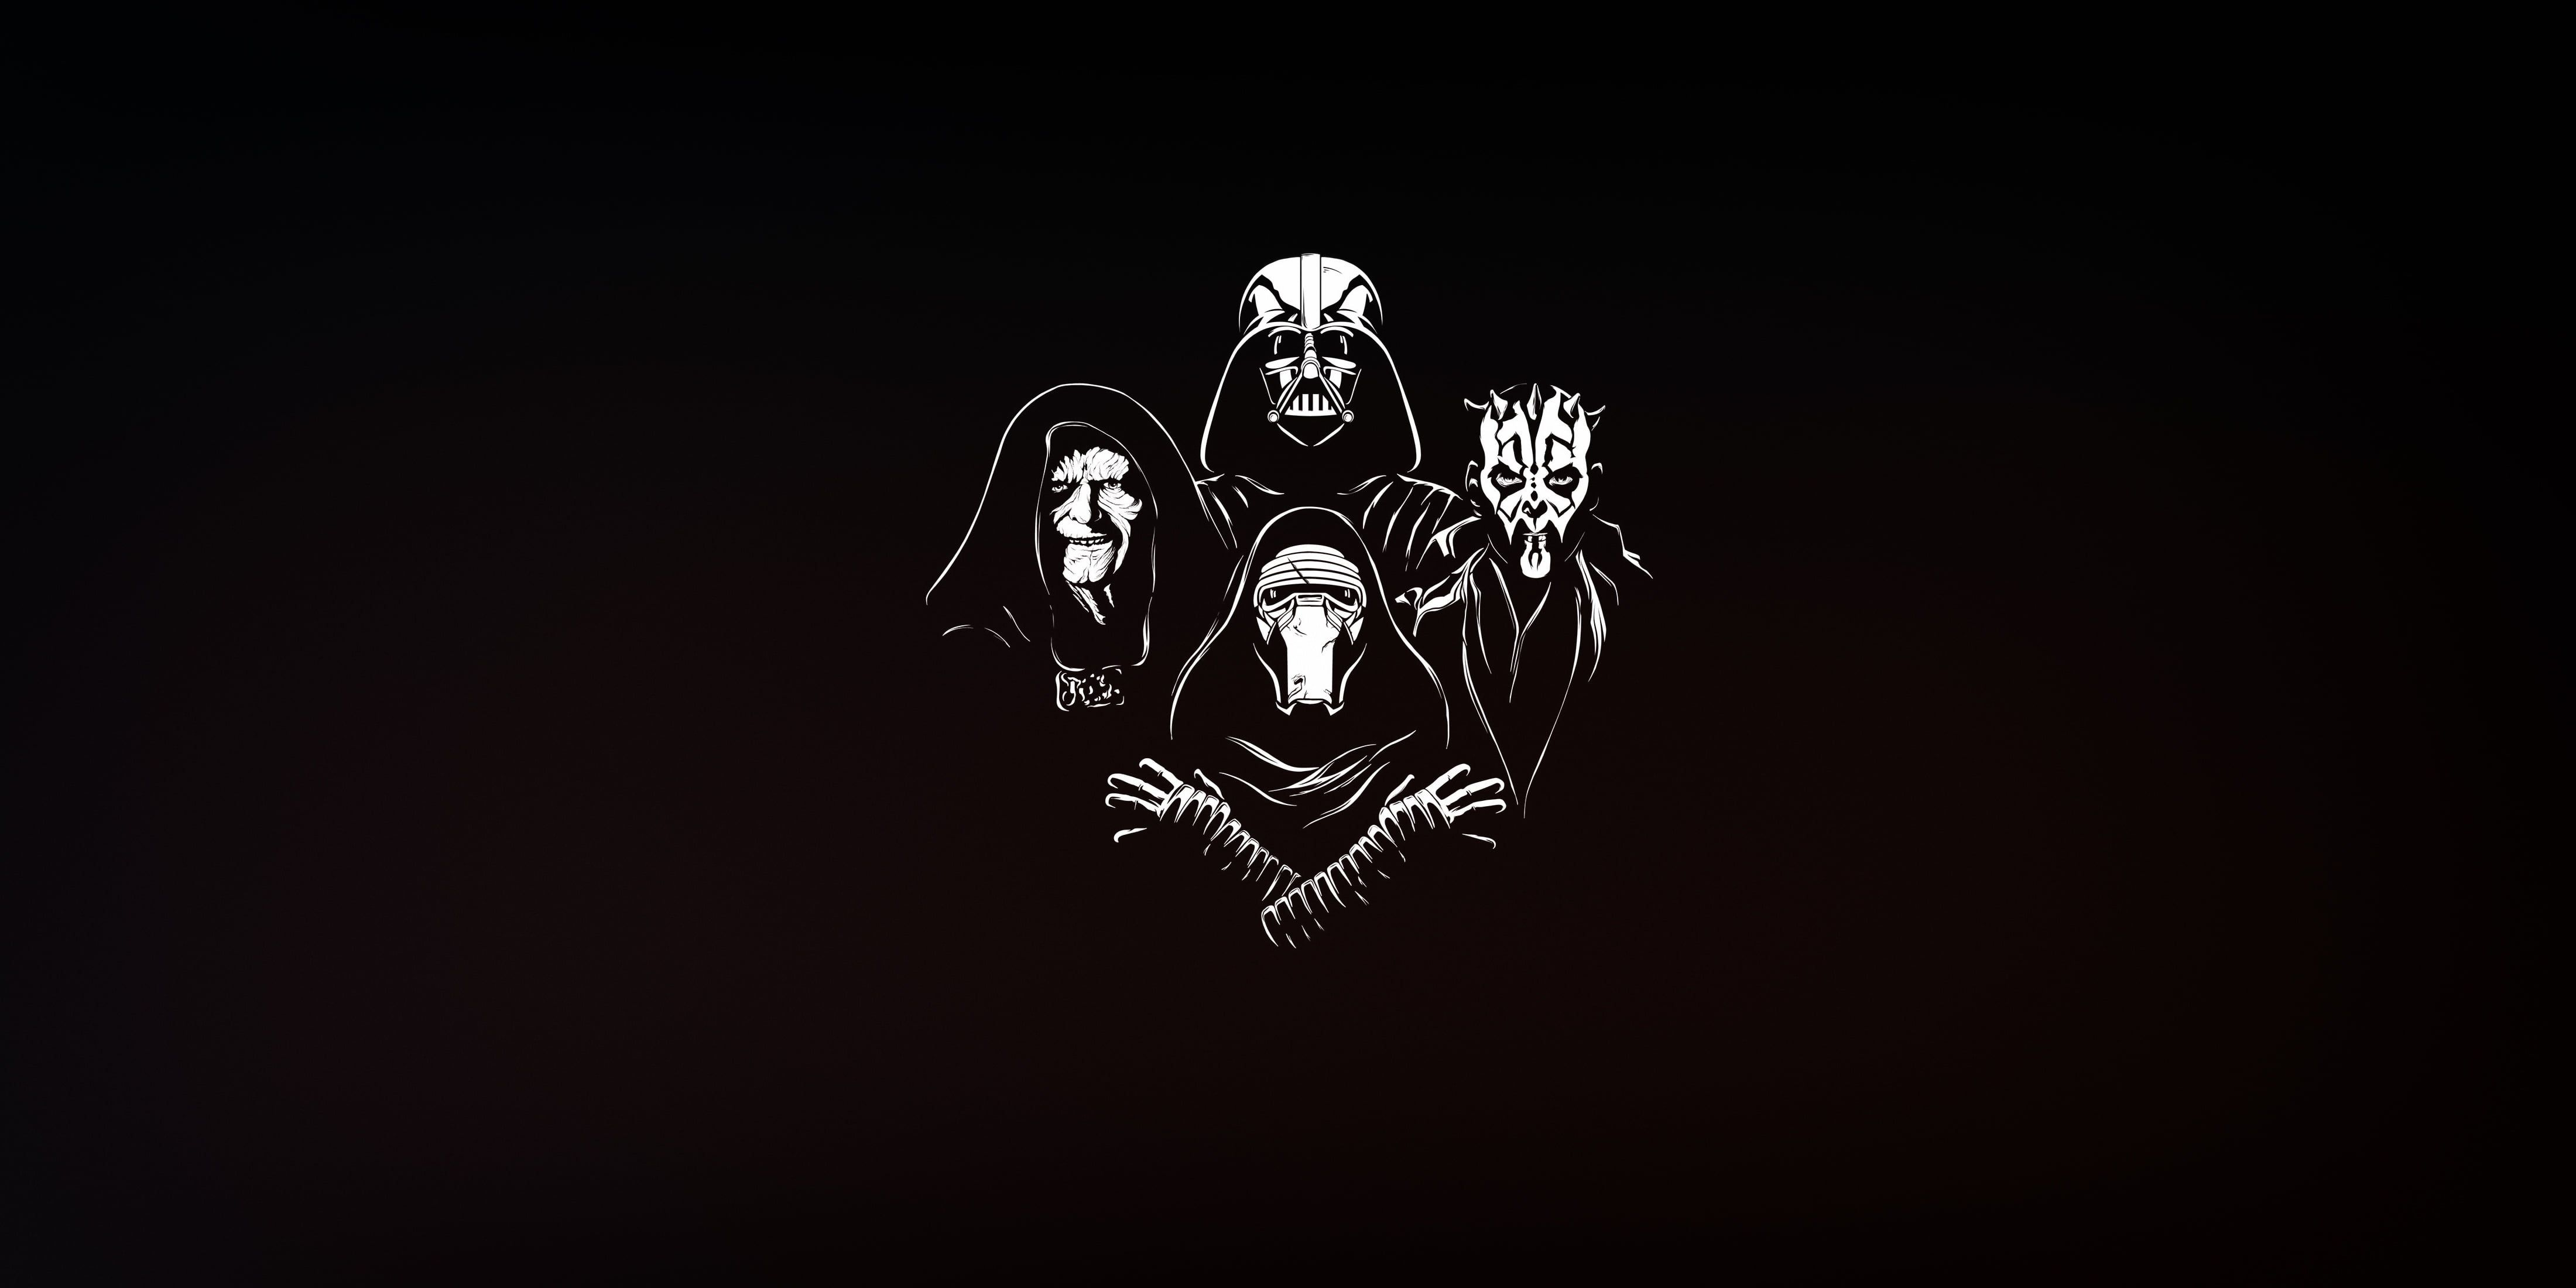 Minimalism Sith Star Wars Artwork Simple Background Darth Maul Emperor Palpatine Darth Vader Kylo Star Wars Artwork Star Wars Background Simple Backgrounds